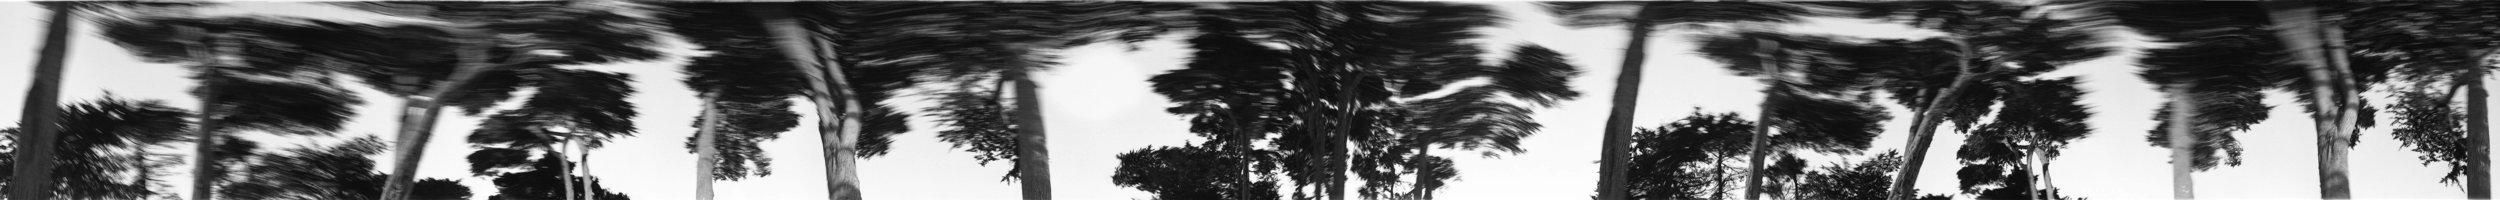 Timeline_trees.jpg